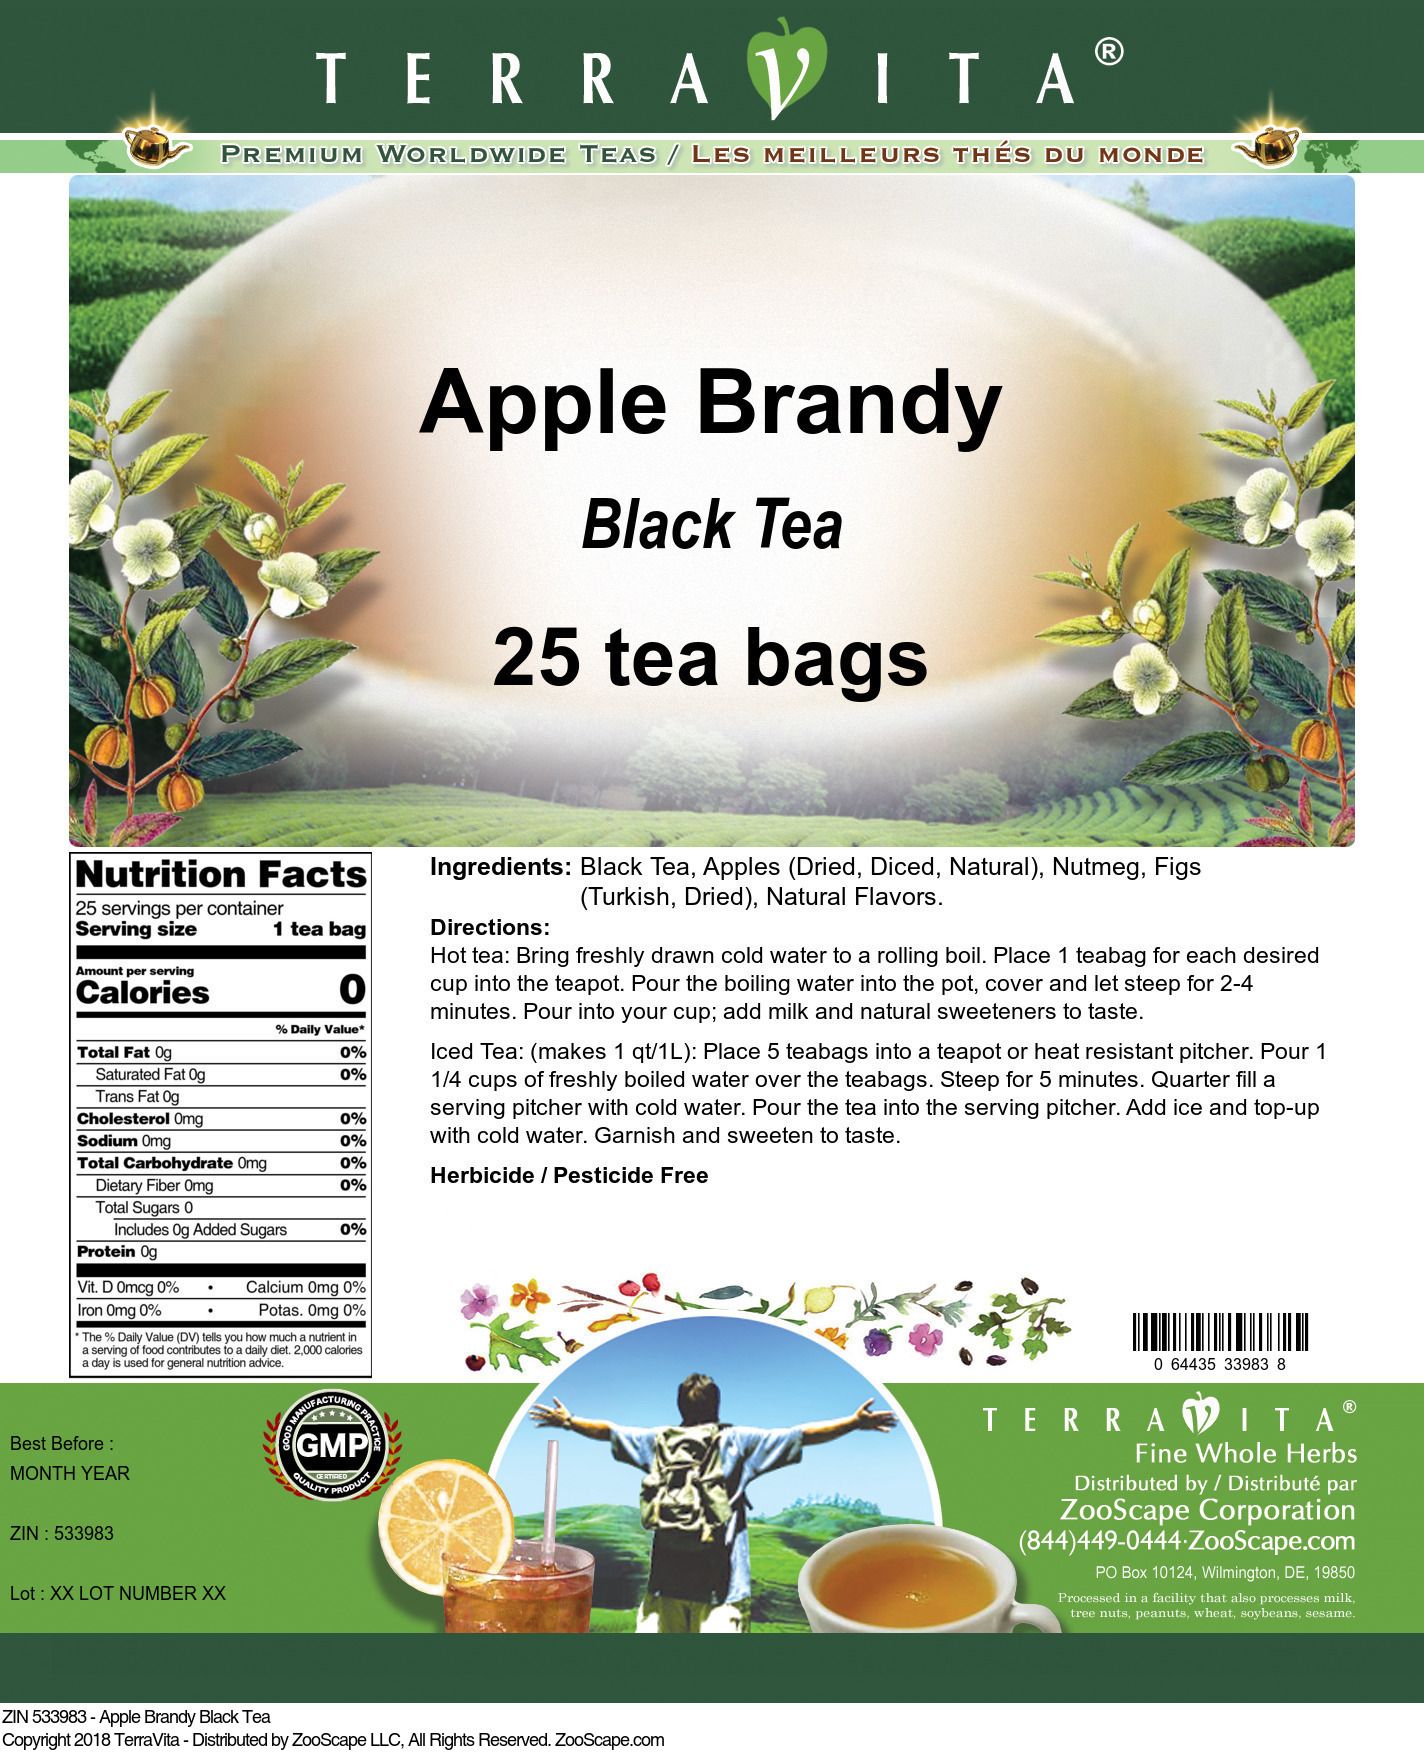 Apple Brandy Black Tea